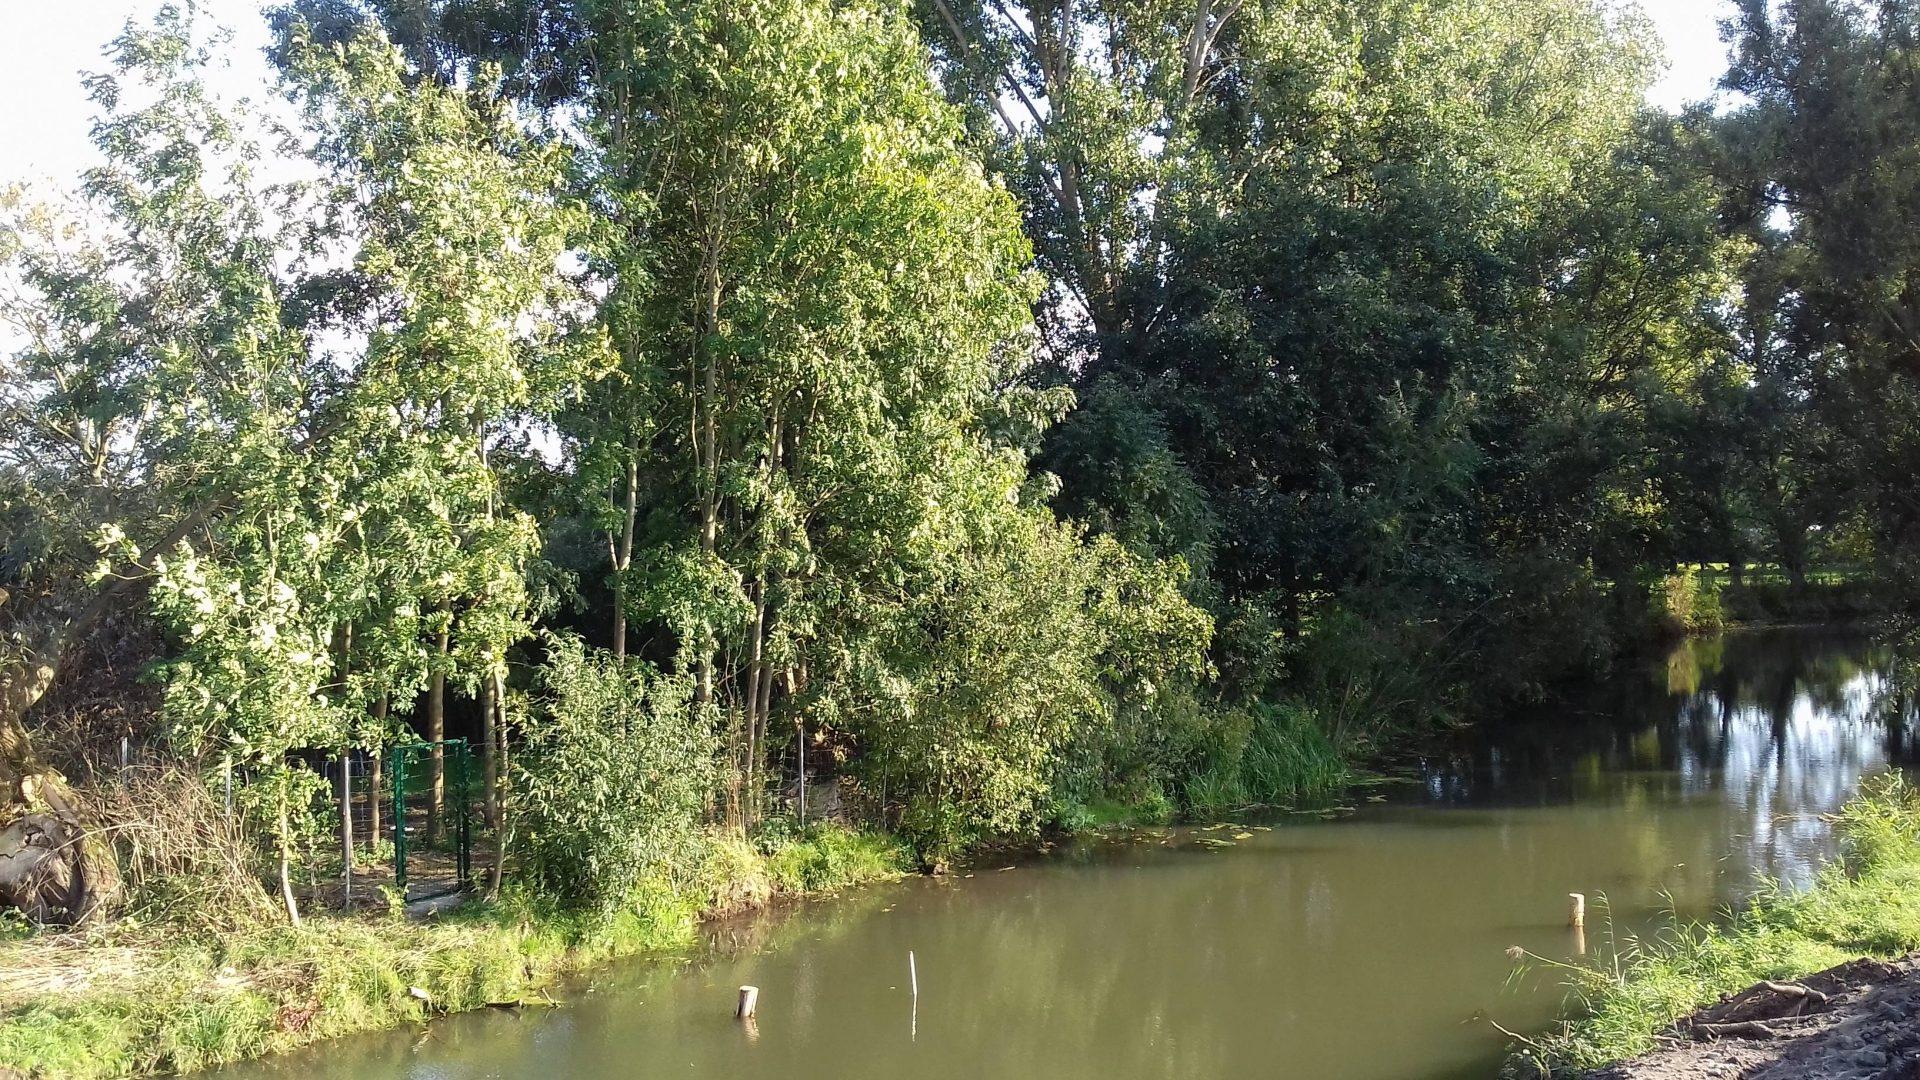 Schunter intakt. Grüne Bäume säumen den Flußlauf.